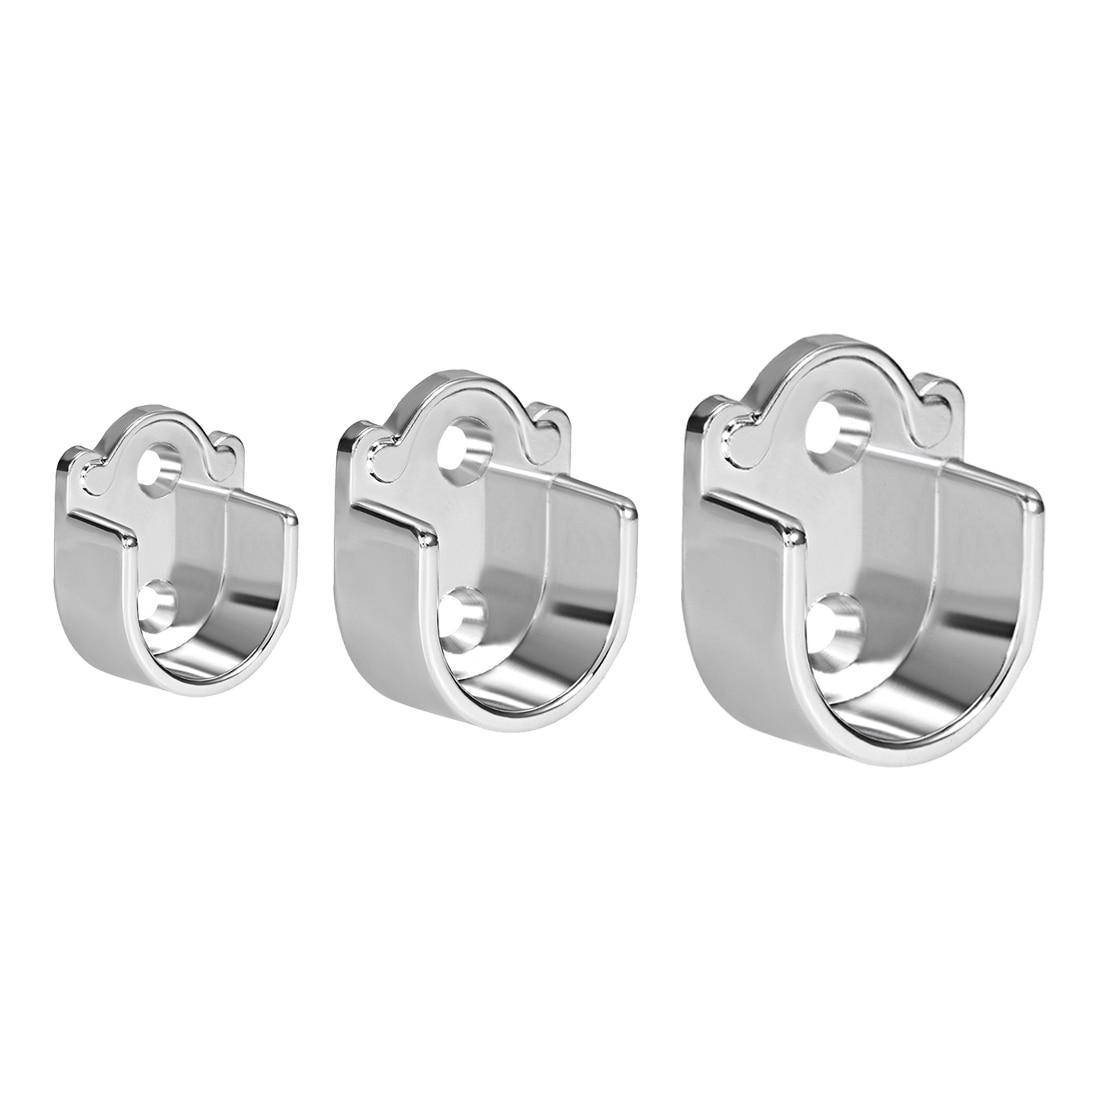 uxcell 2 4 6pcs wardrobe closet rod bracket zinc alloy shower curtain rod pole end supports sockets fit rod dia 19 22 25mm